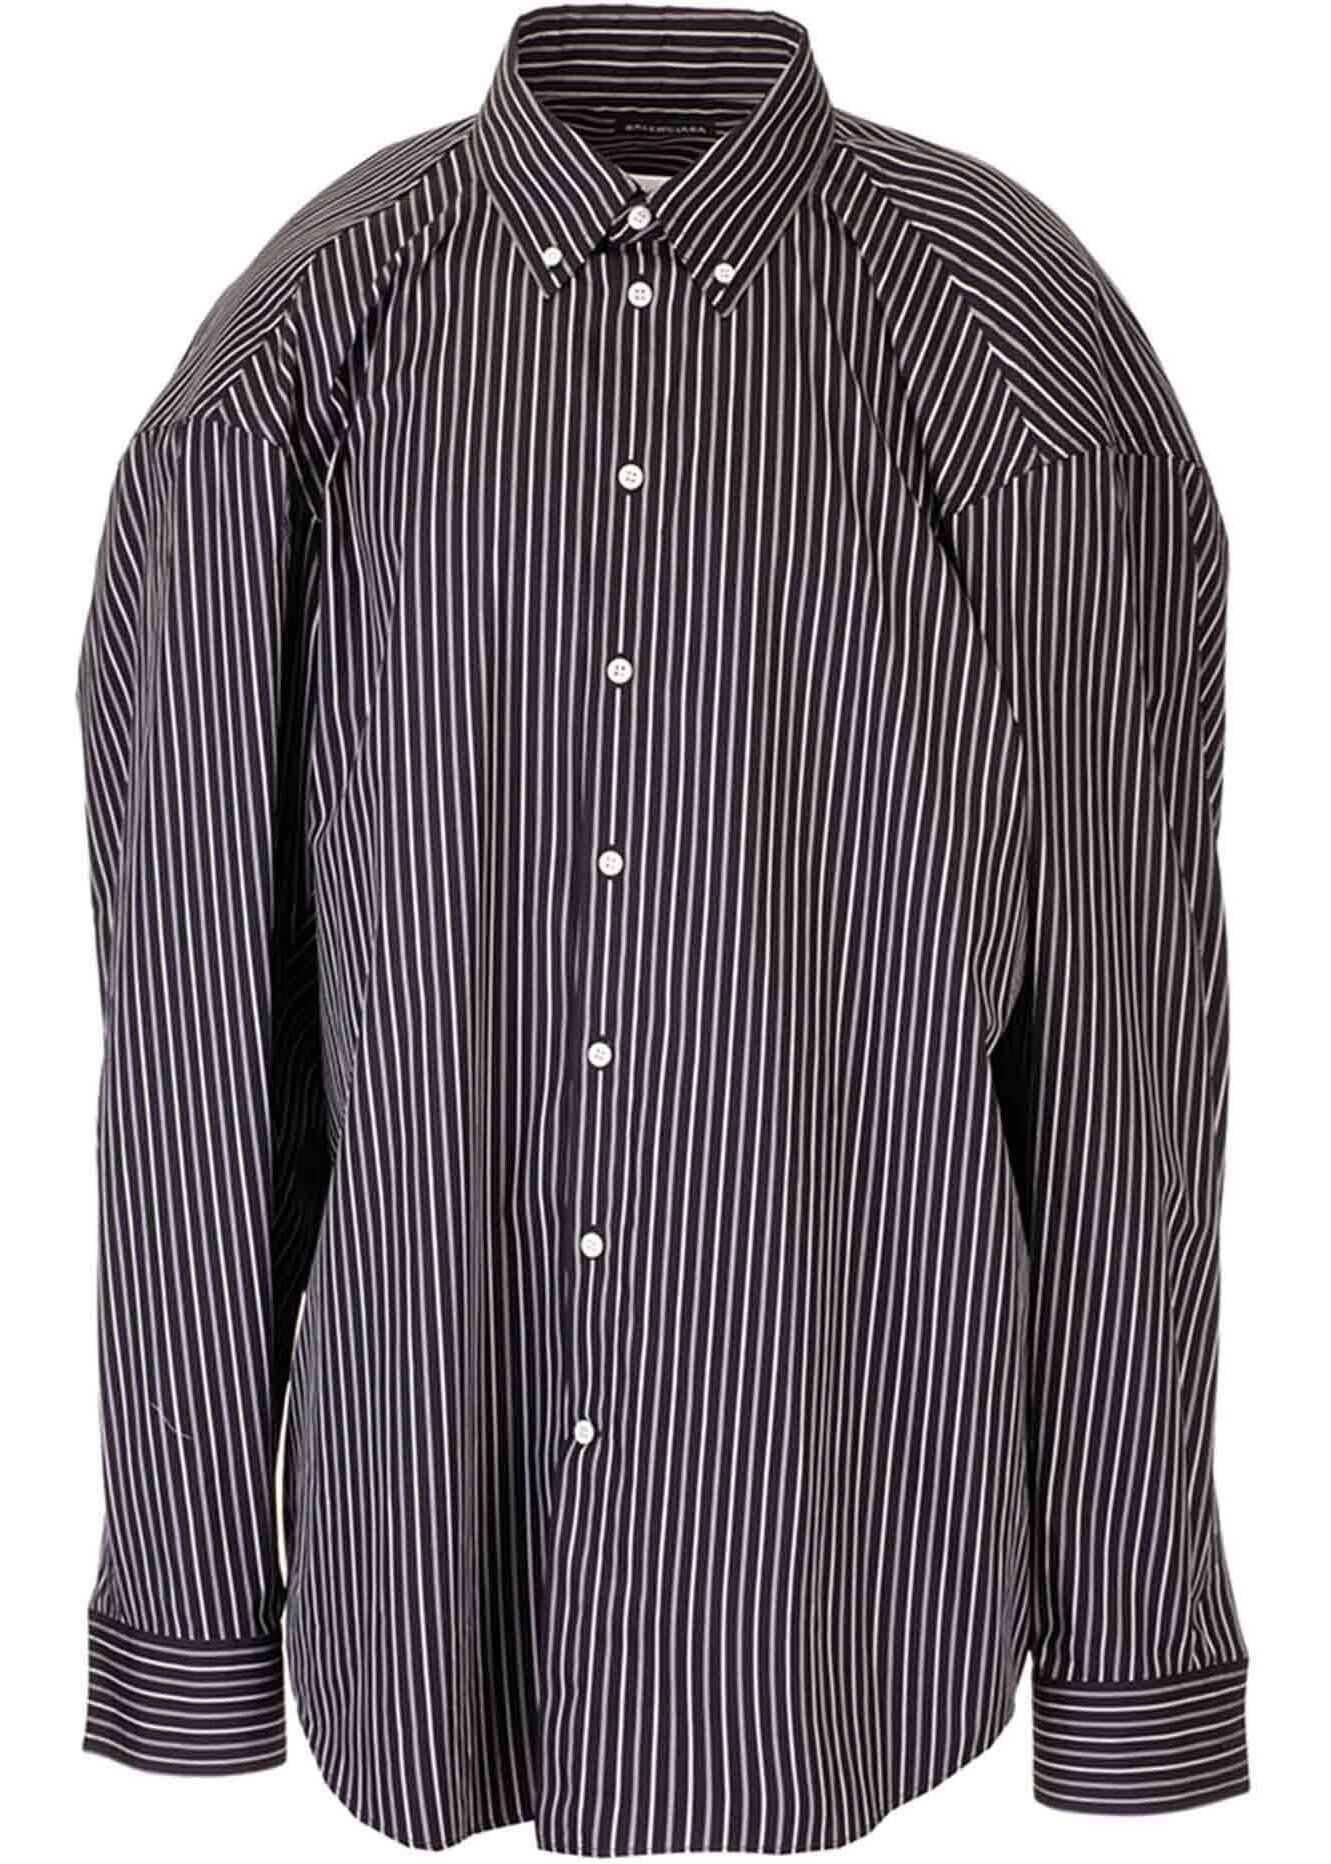 Balenciaga Steroid Striped Shirt In Black Black imagine